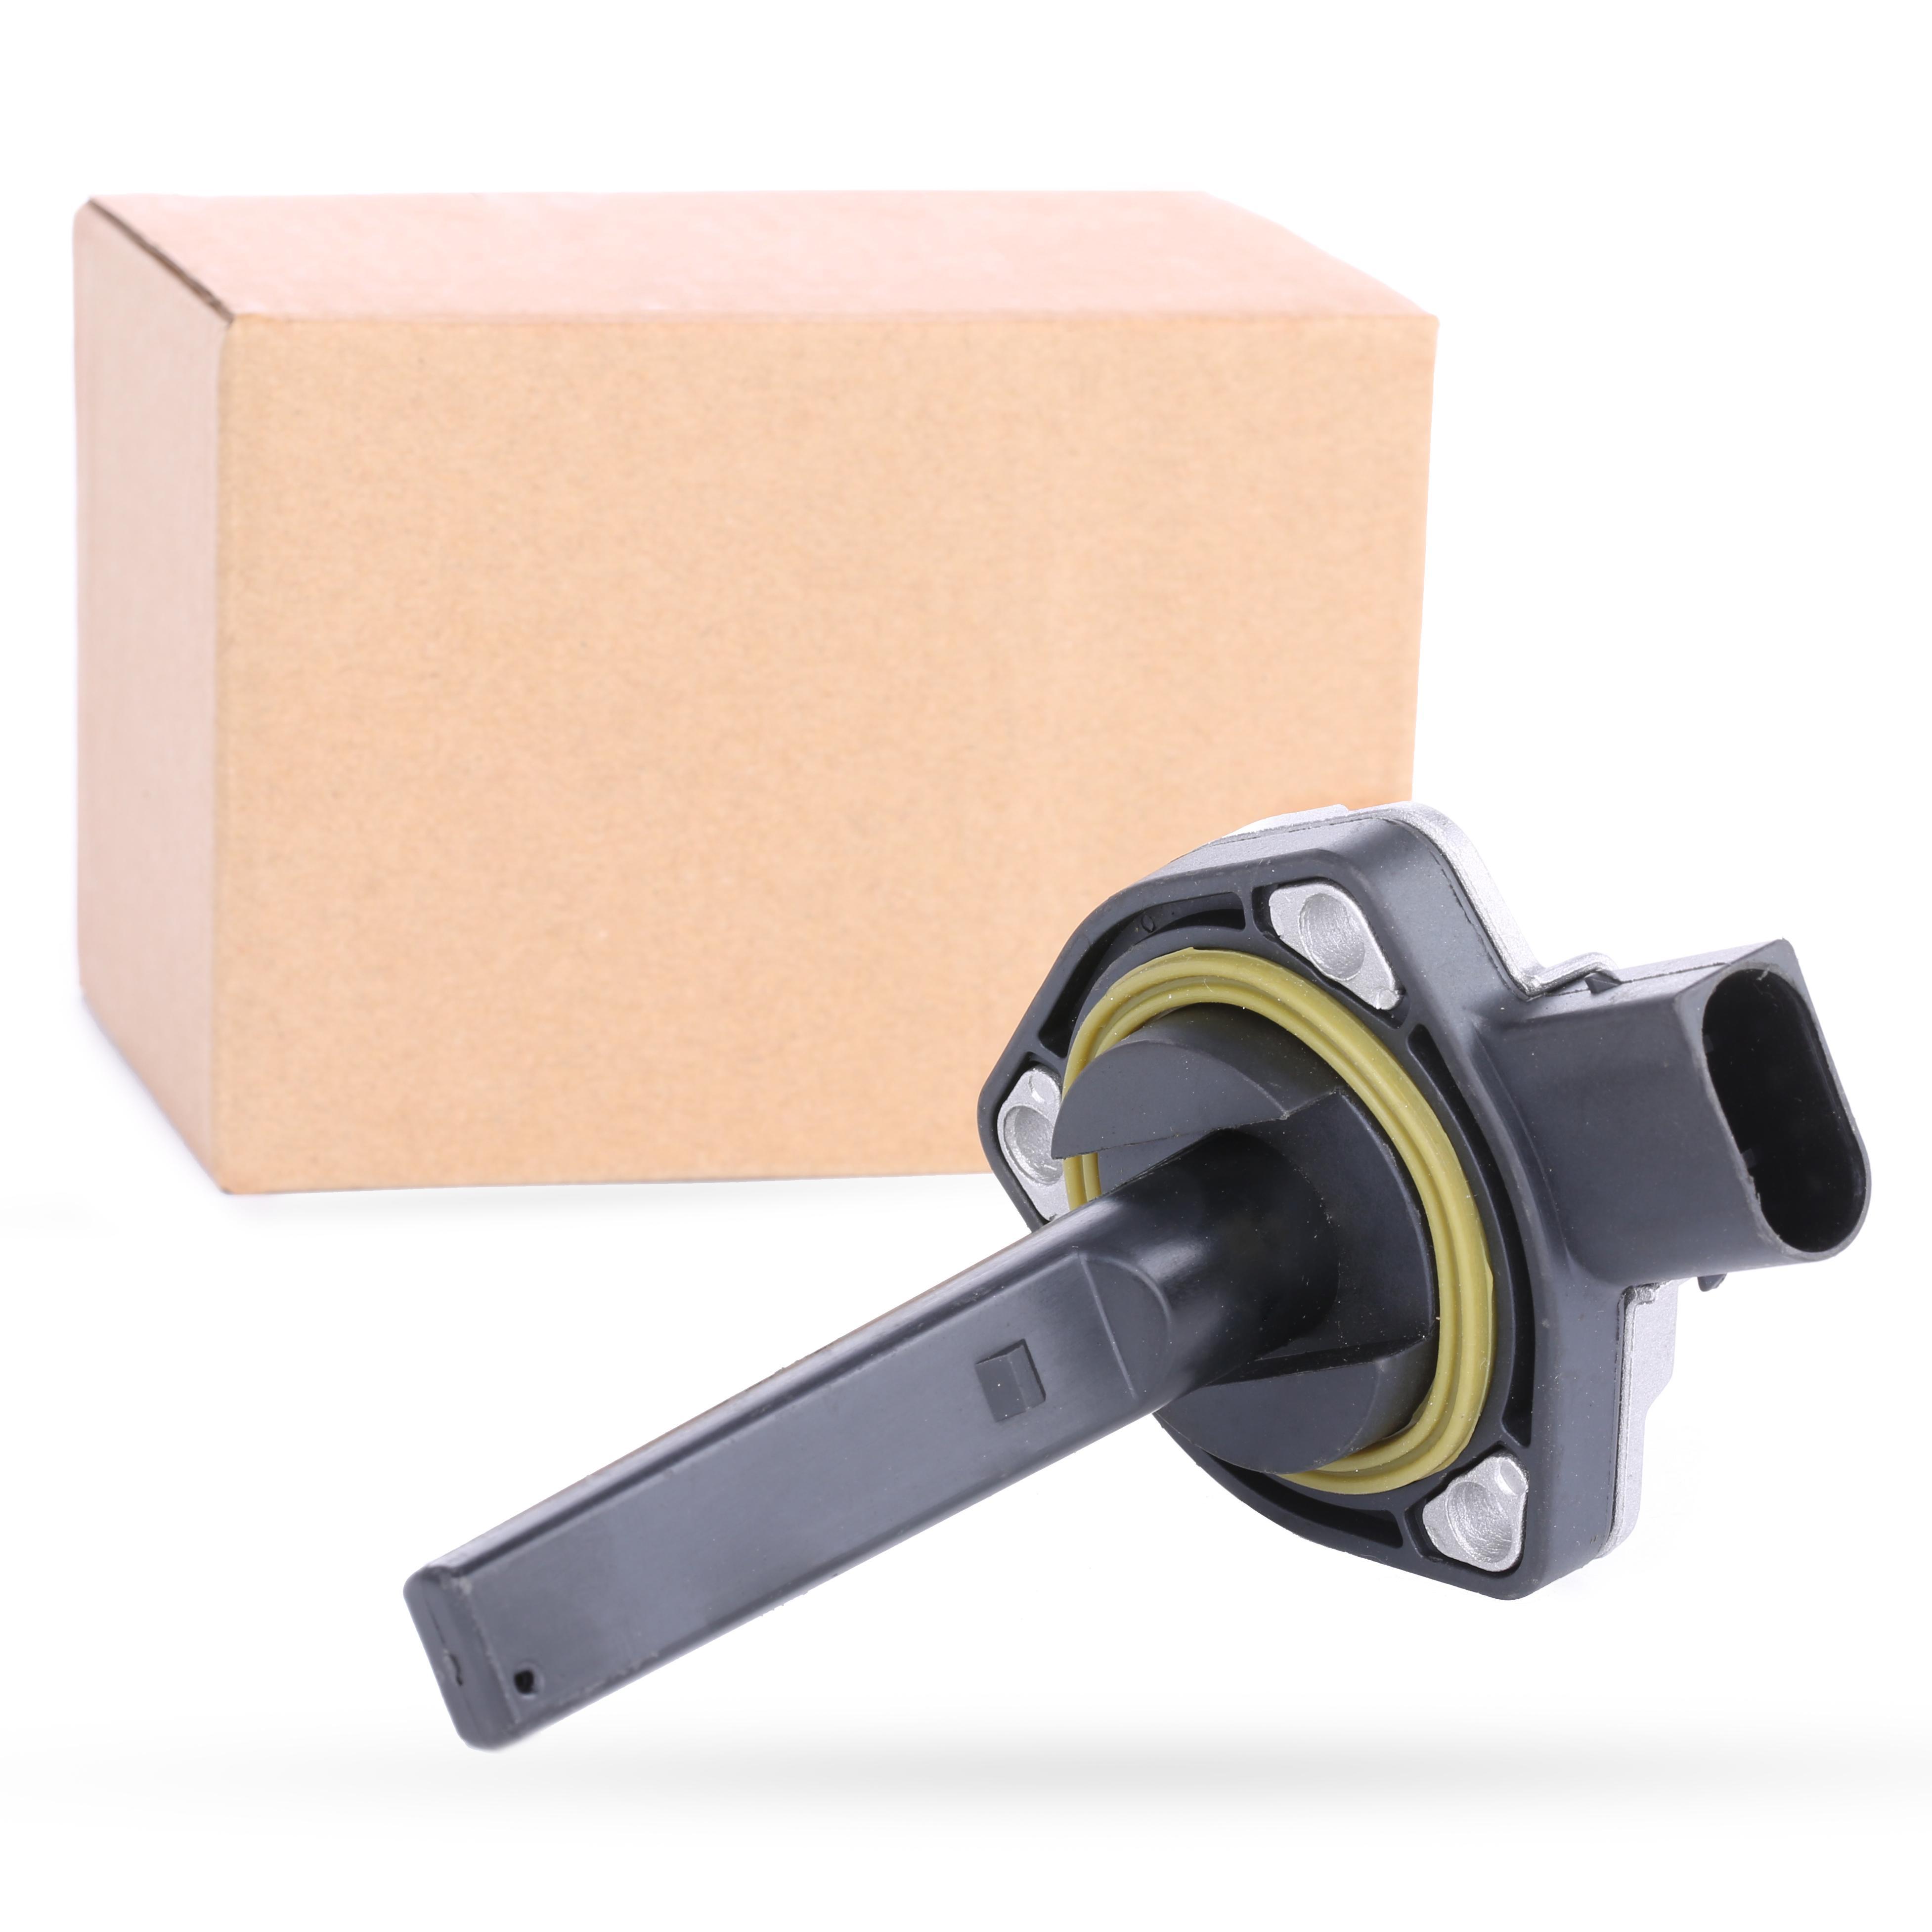 Sensor, Motorölstand ABAKUS 120-06-010 224657133002221330022